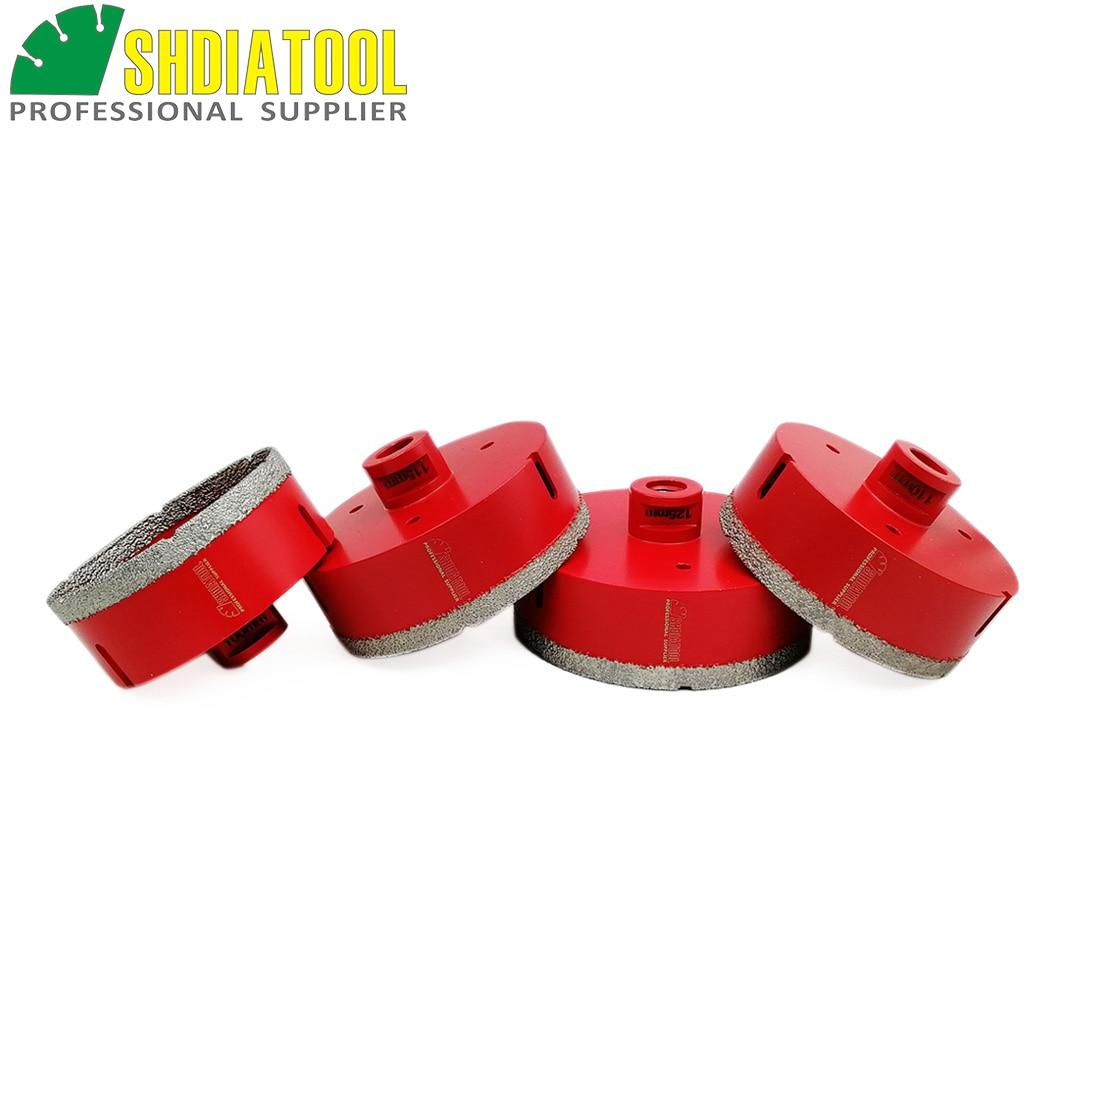 SHDIATOOL 100/110/115/125mm Vacuum Brazed Diamond M14 Drilling Drill Core Bit Diamond Height 10mm Hole Saw Porcelain Tile